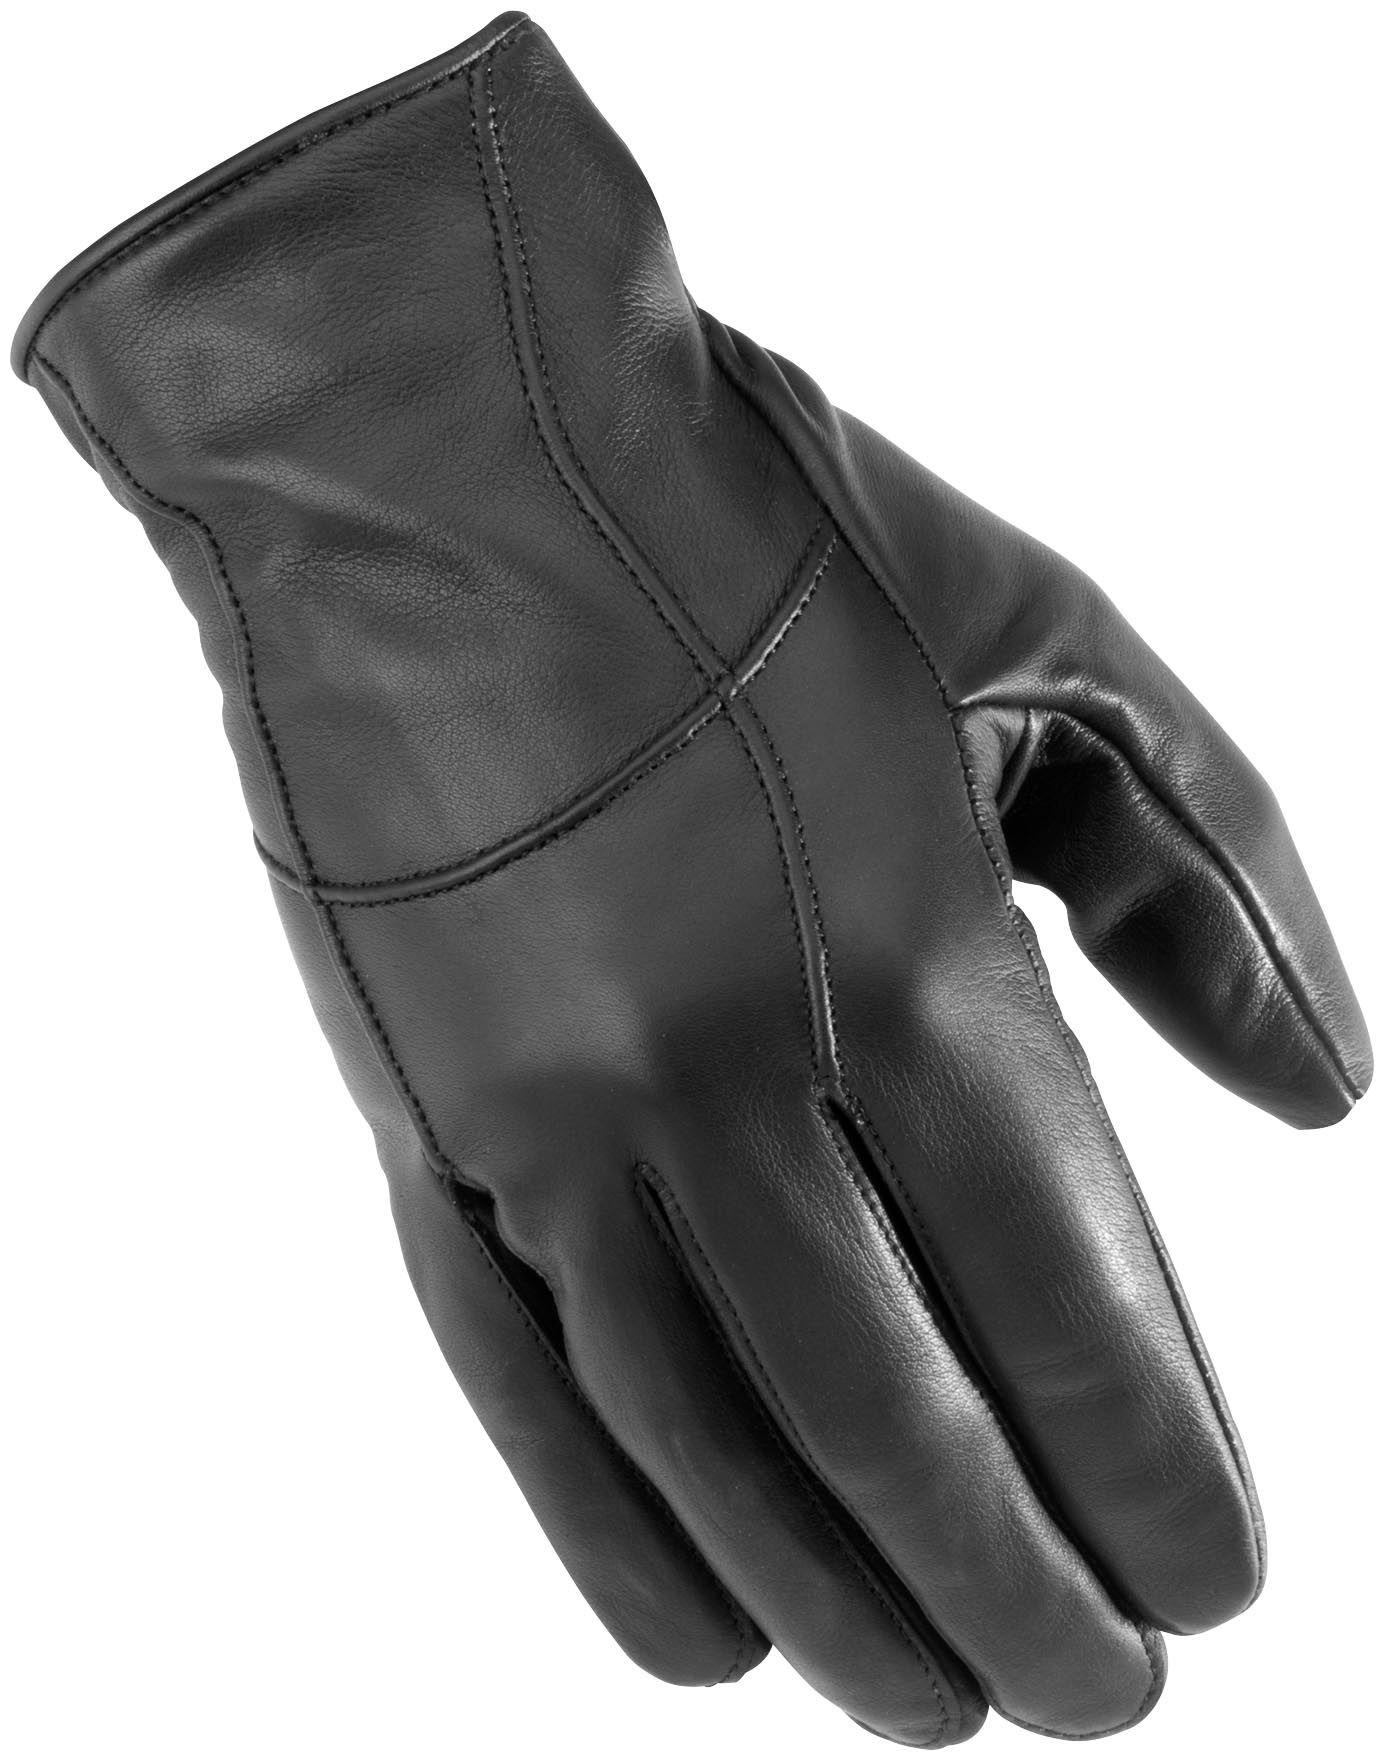 Z1R Mens 270 leather motorcycle biker street gloves